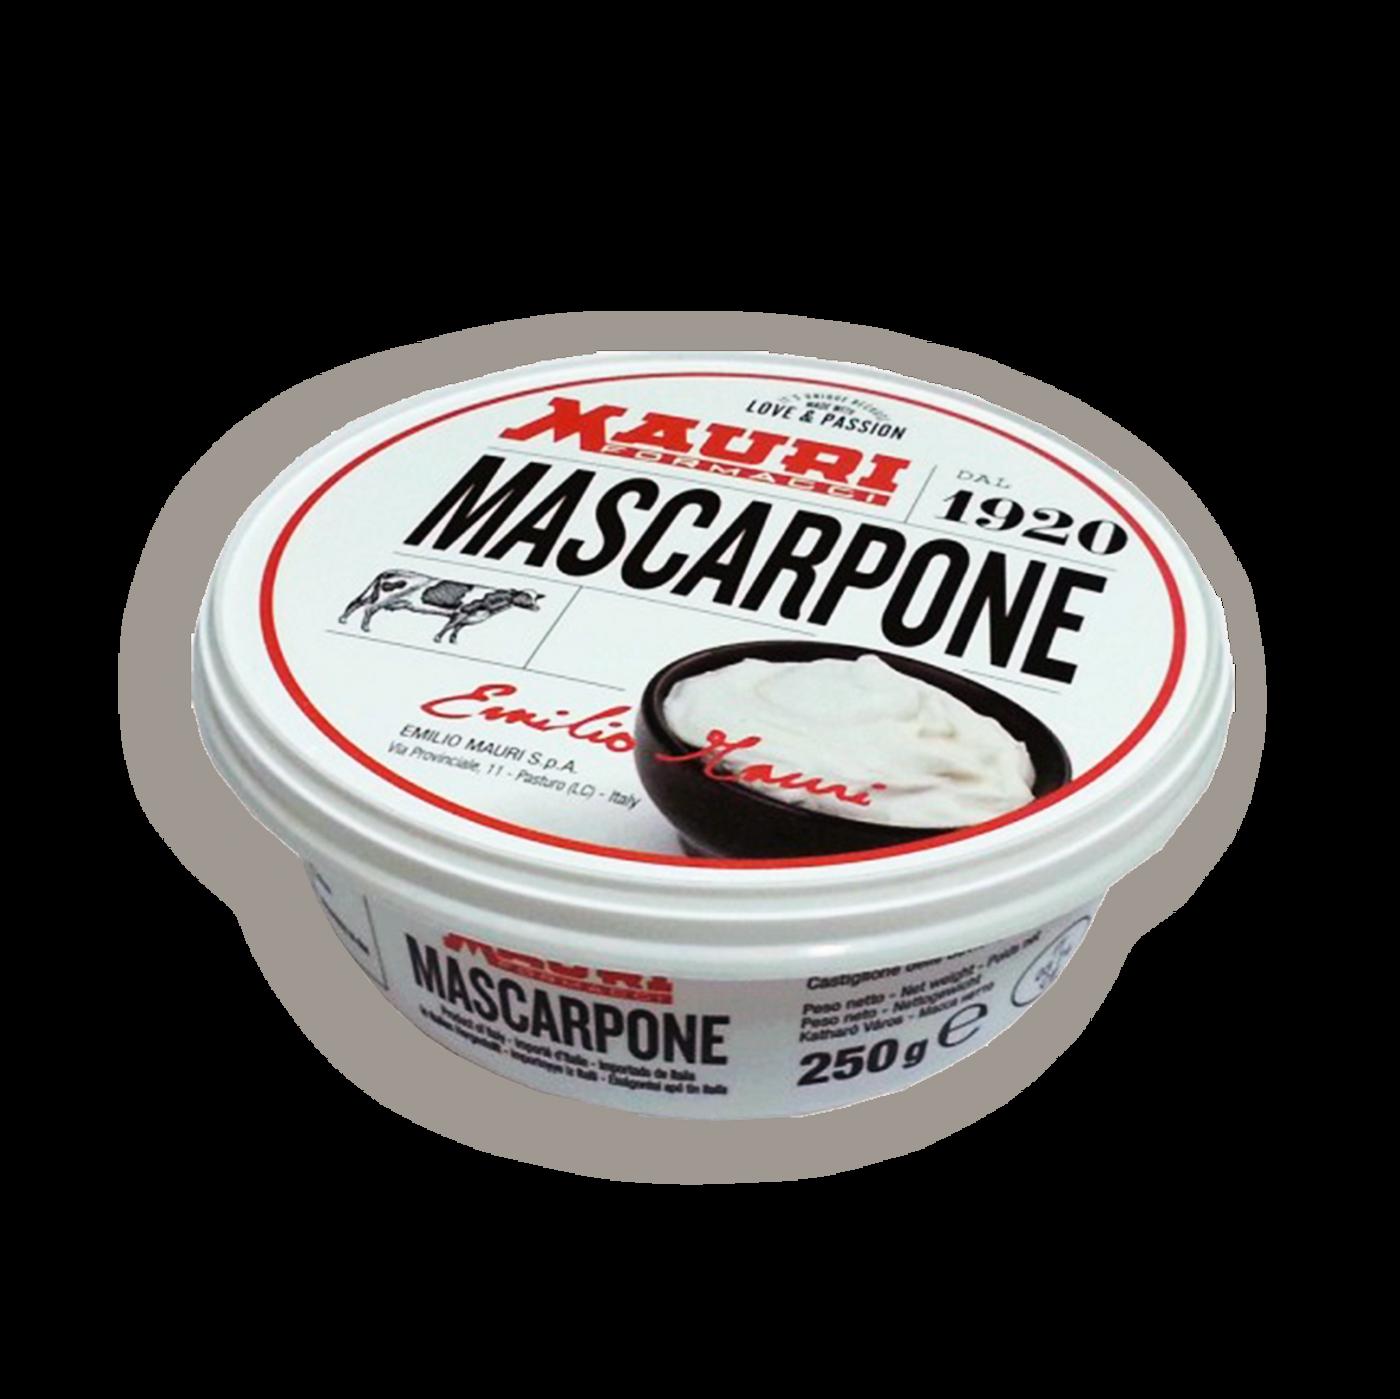 Mascarpone Fresco